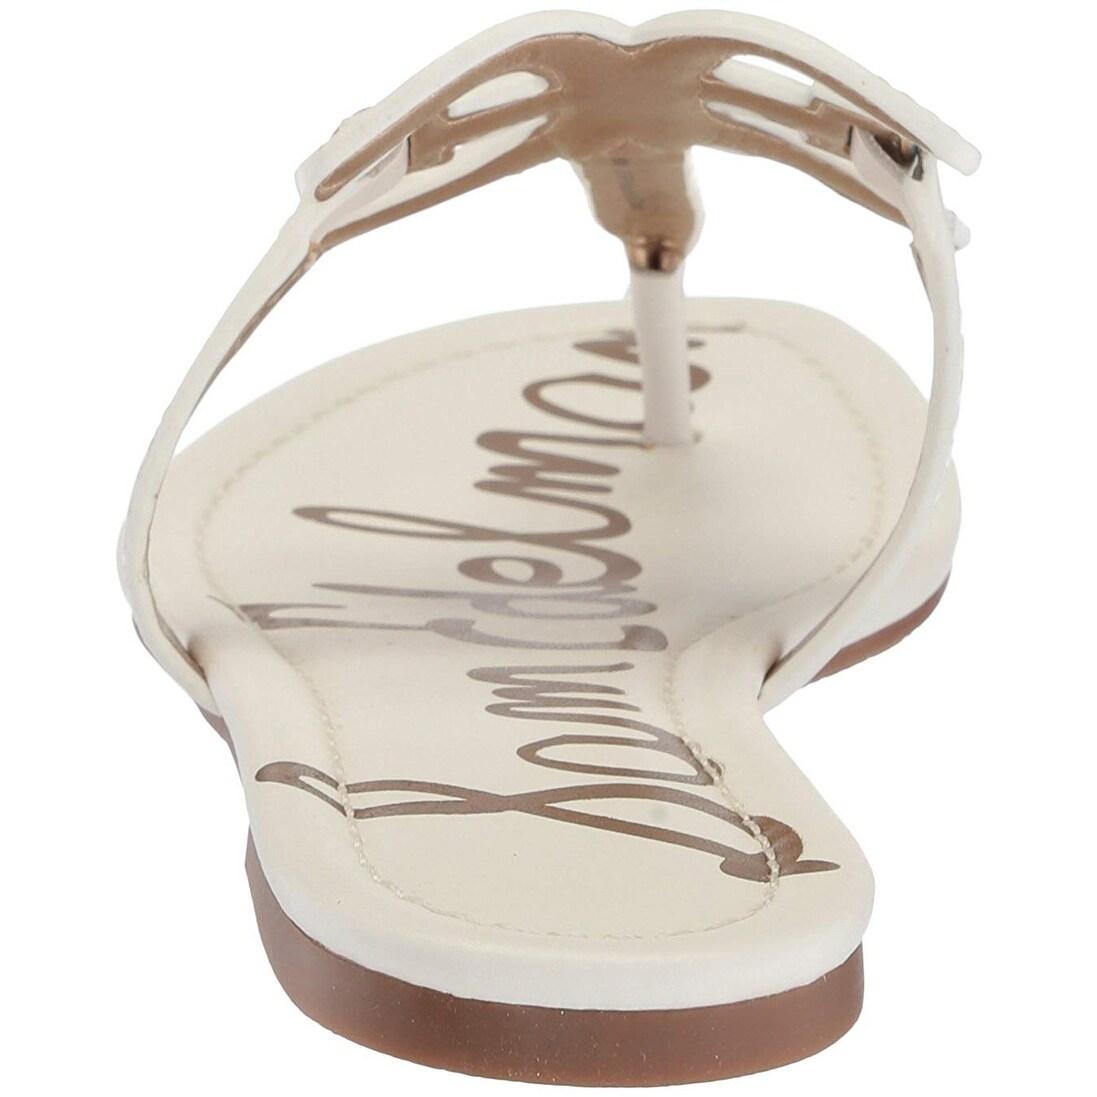 e68861051 Shop Sam Edelman Women s Carter Flat Sandal - Free Shipping Today -  Overstock - 25559789